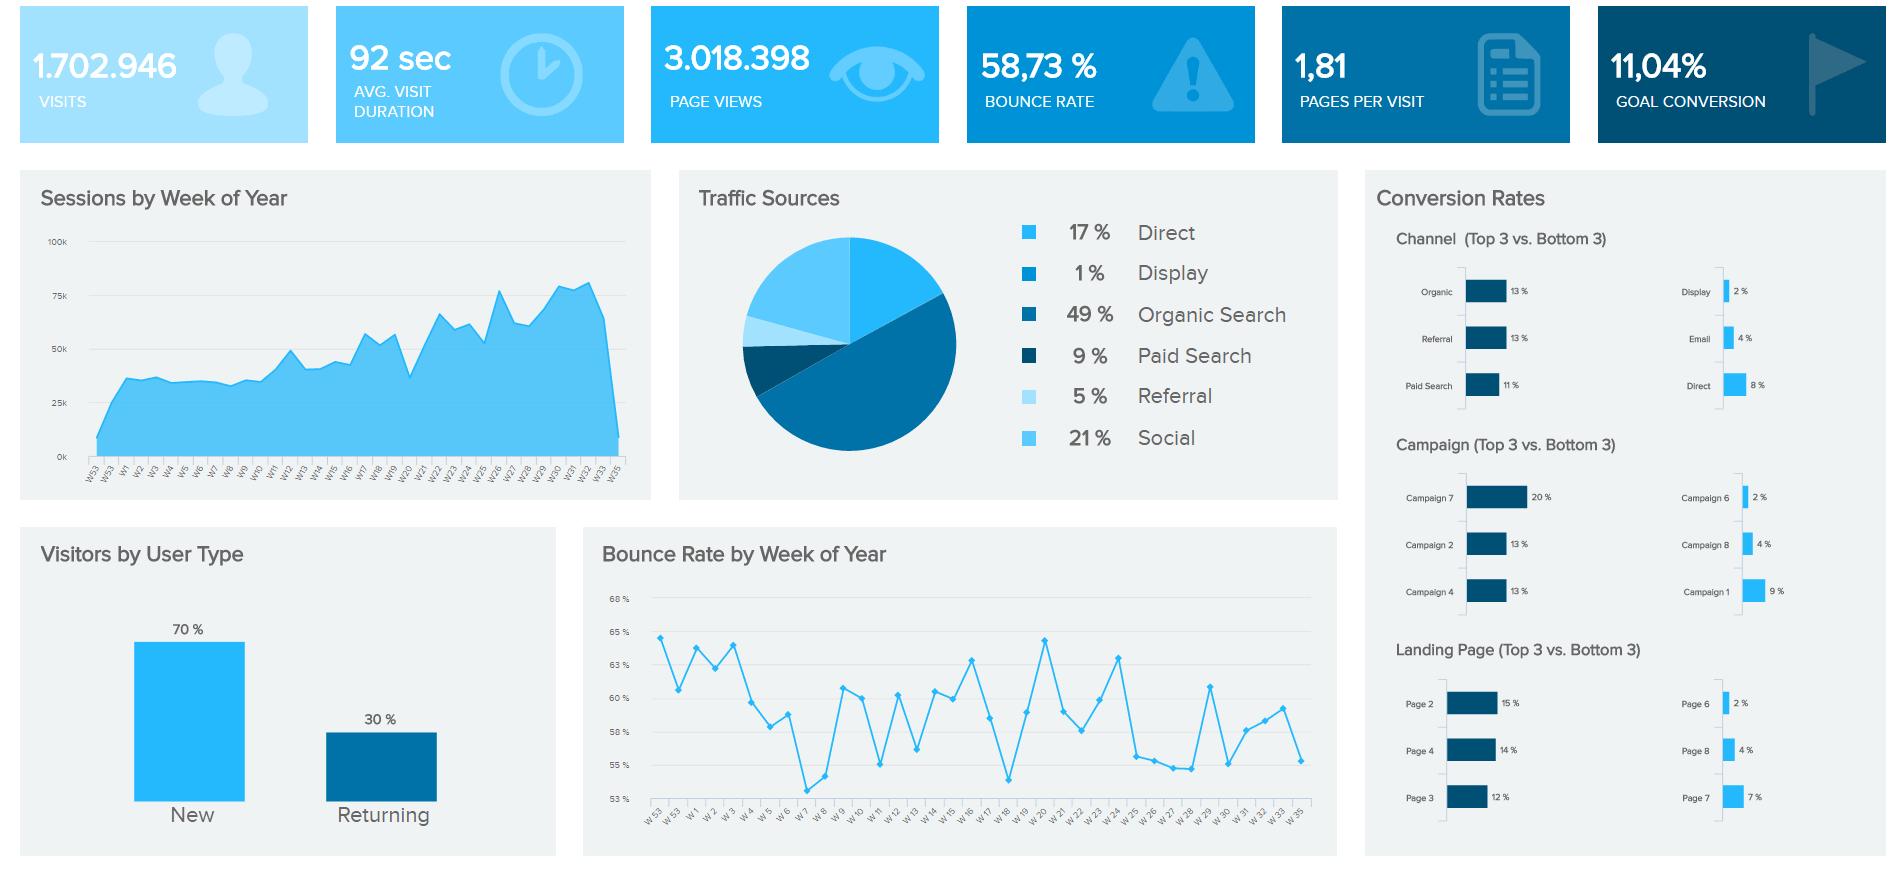 marketing dashboard by datapine gathering main marketing KPIs